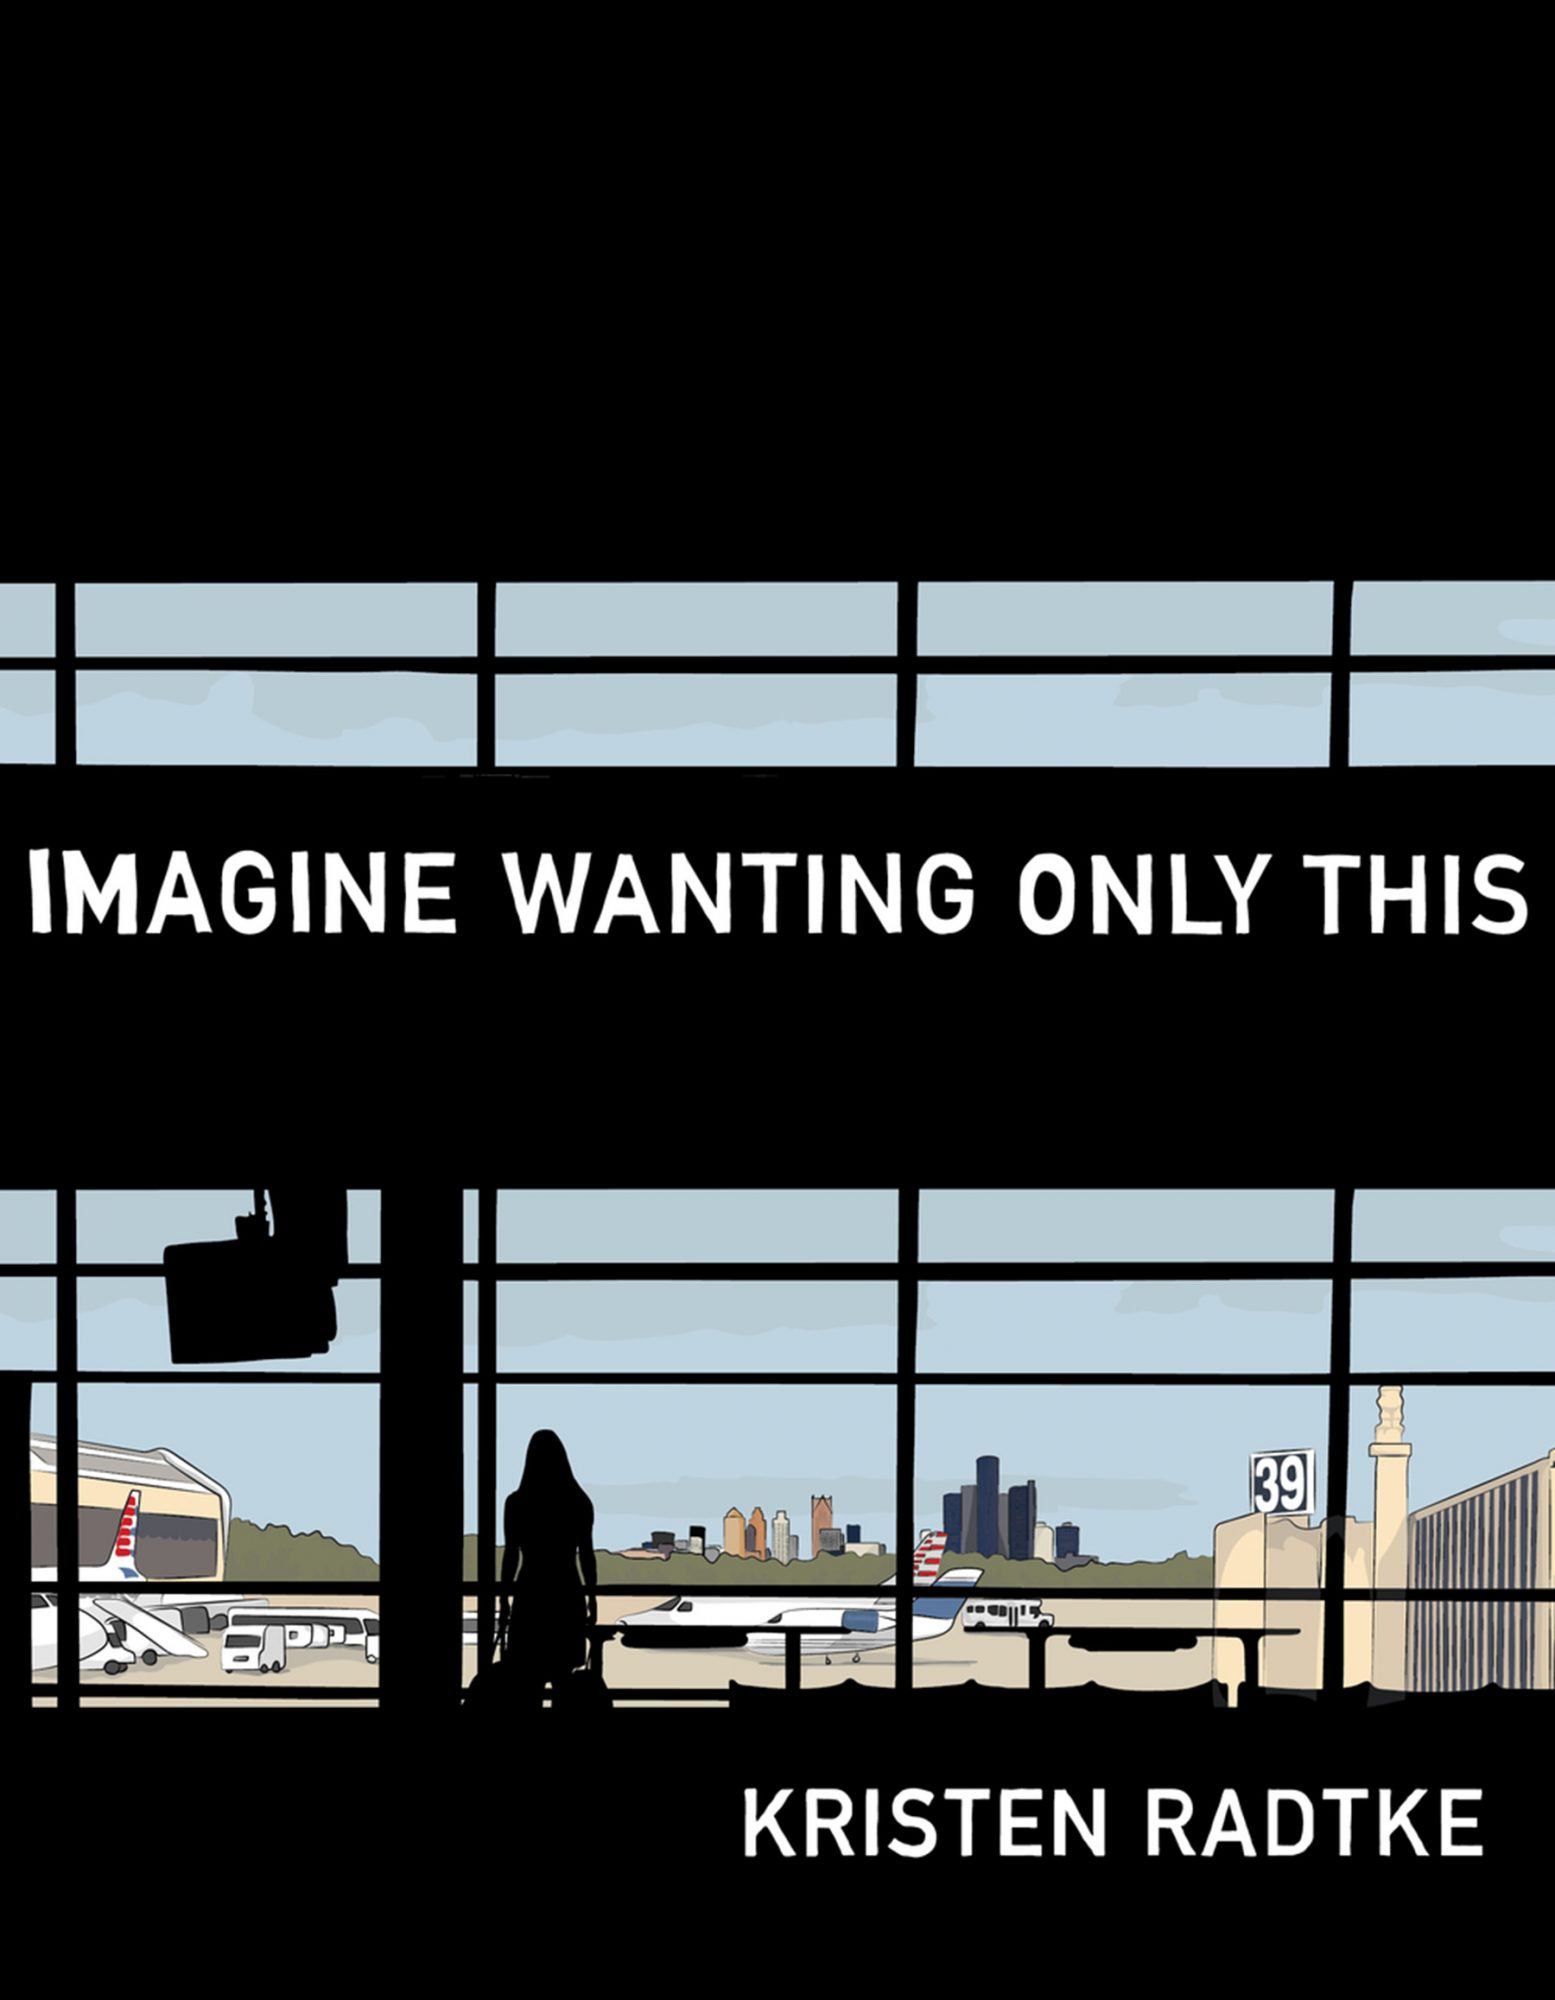 Kristen Radtke, Imagine Wanting Only This